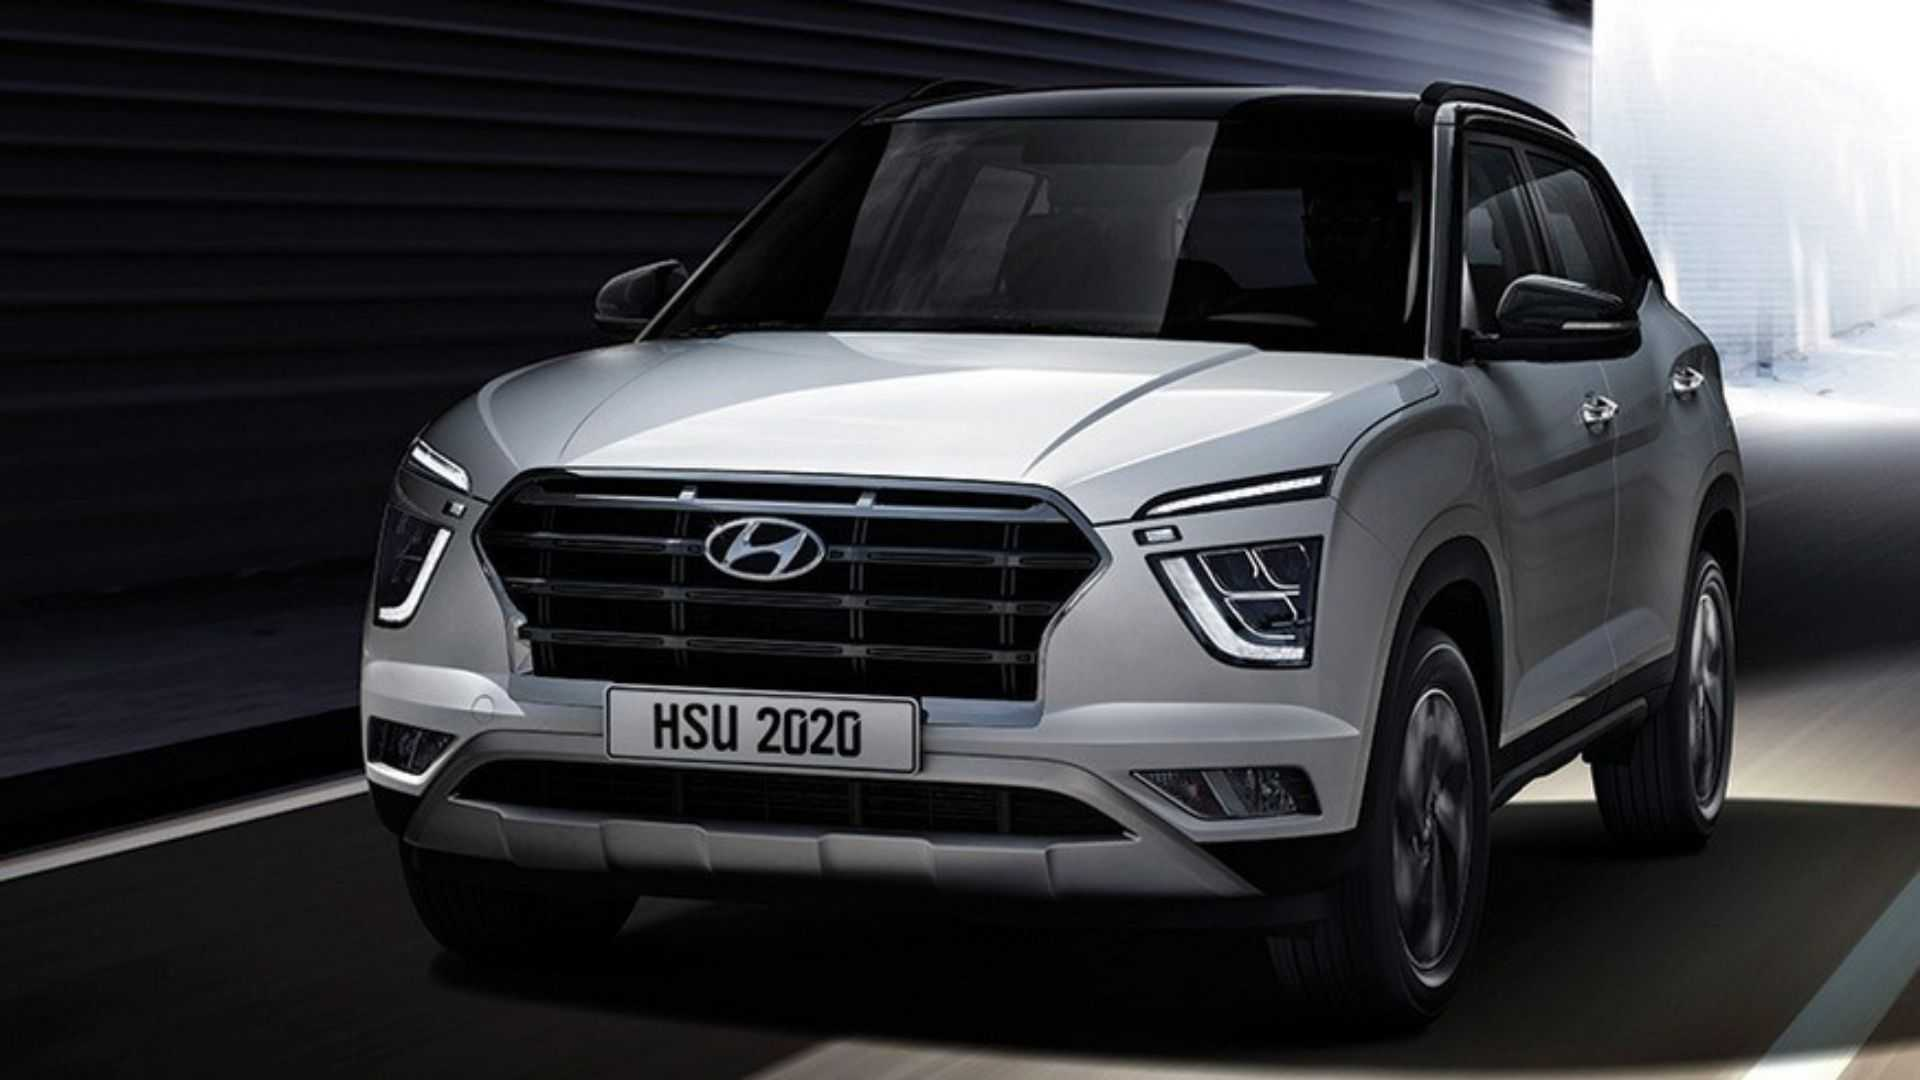 Novo Hyundai Creta E Confirmado Para Oriente Medio E Africa Brasil Aguarda